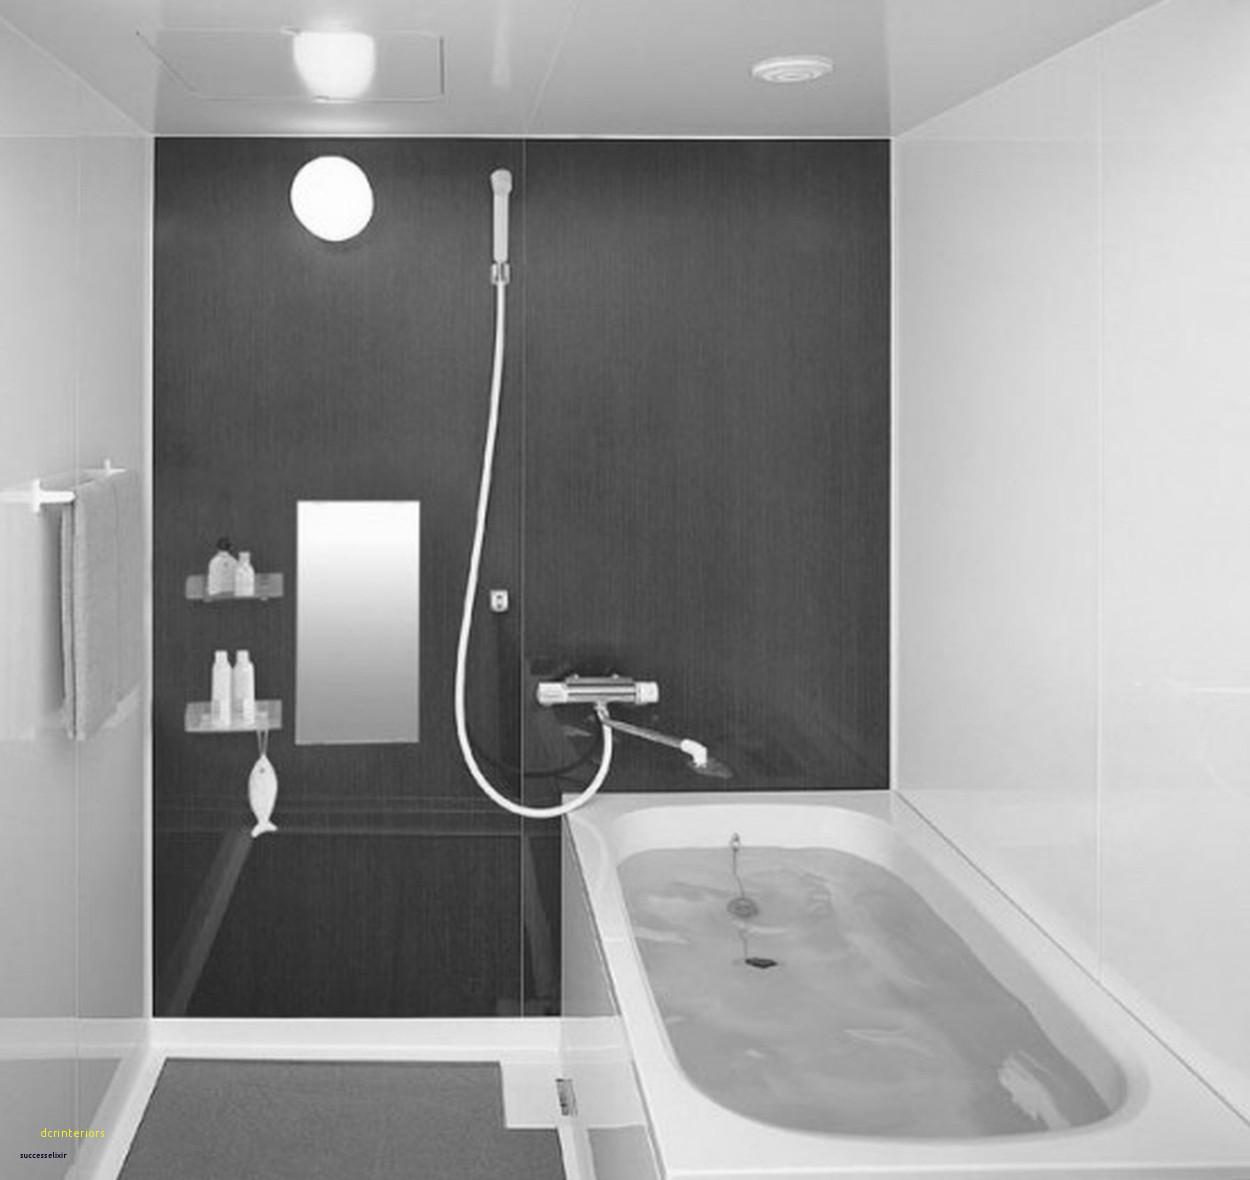 modern hardwood flooring ideas of 36 superb modern floor tiles decoration in elegant tiles for bathroom beautiful tile ideas gray 0d than modern bathrooml home design home